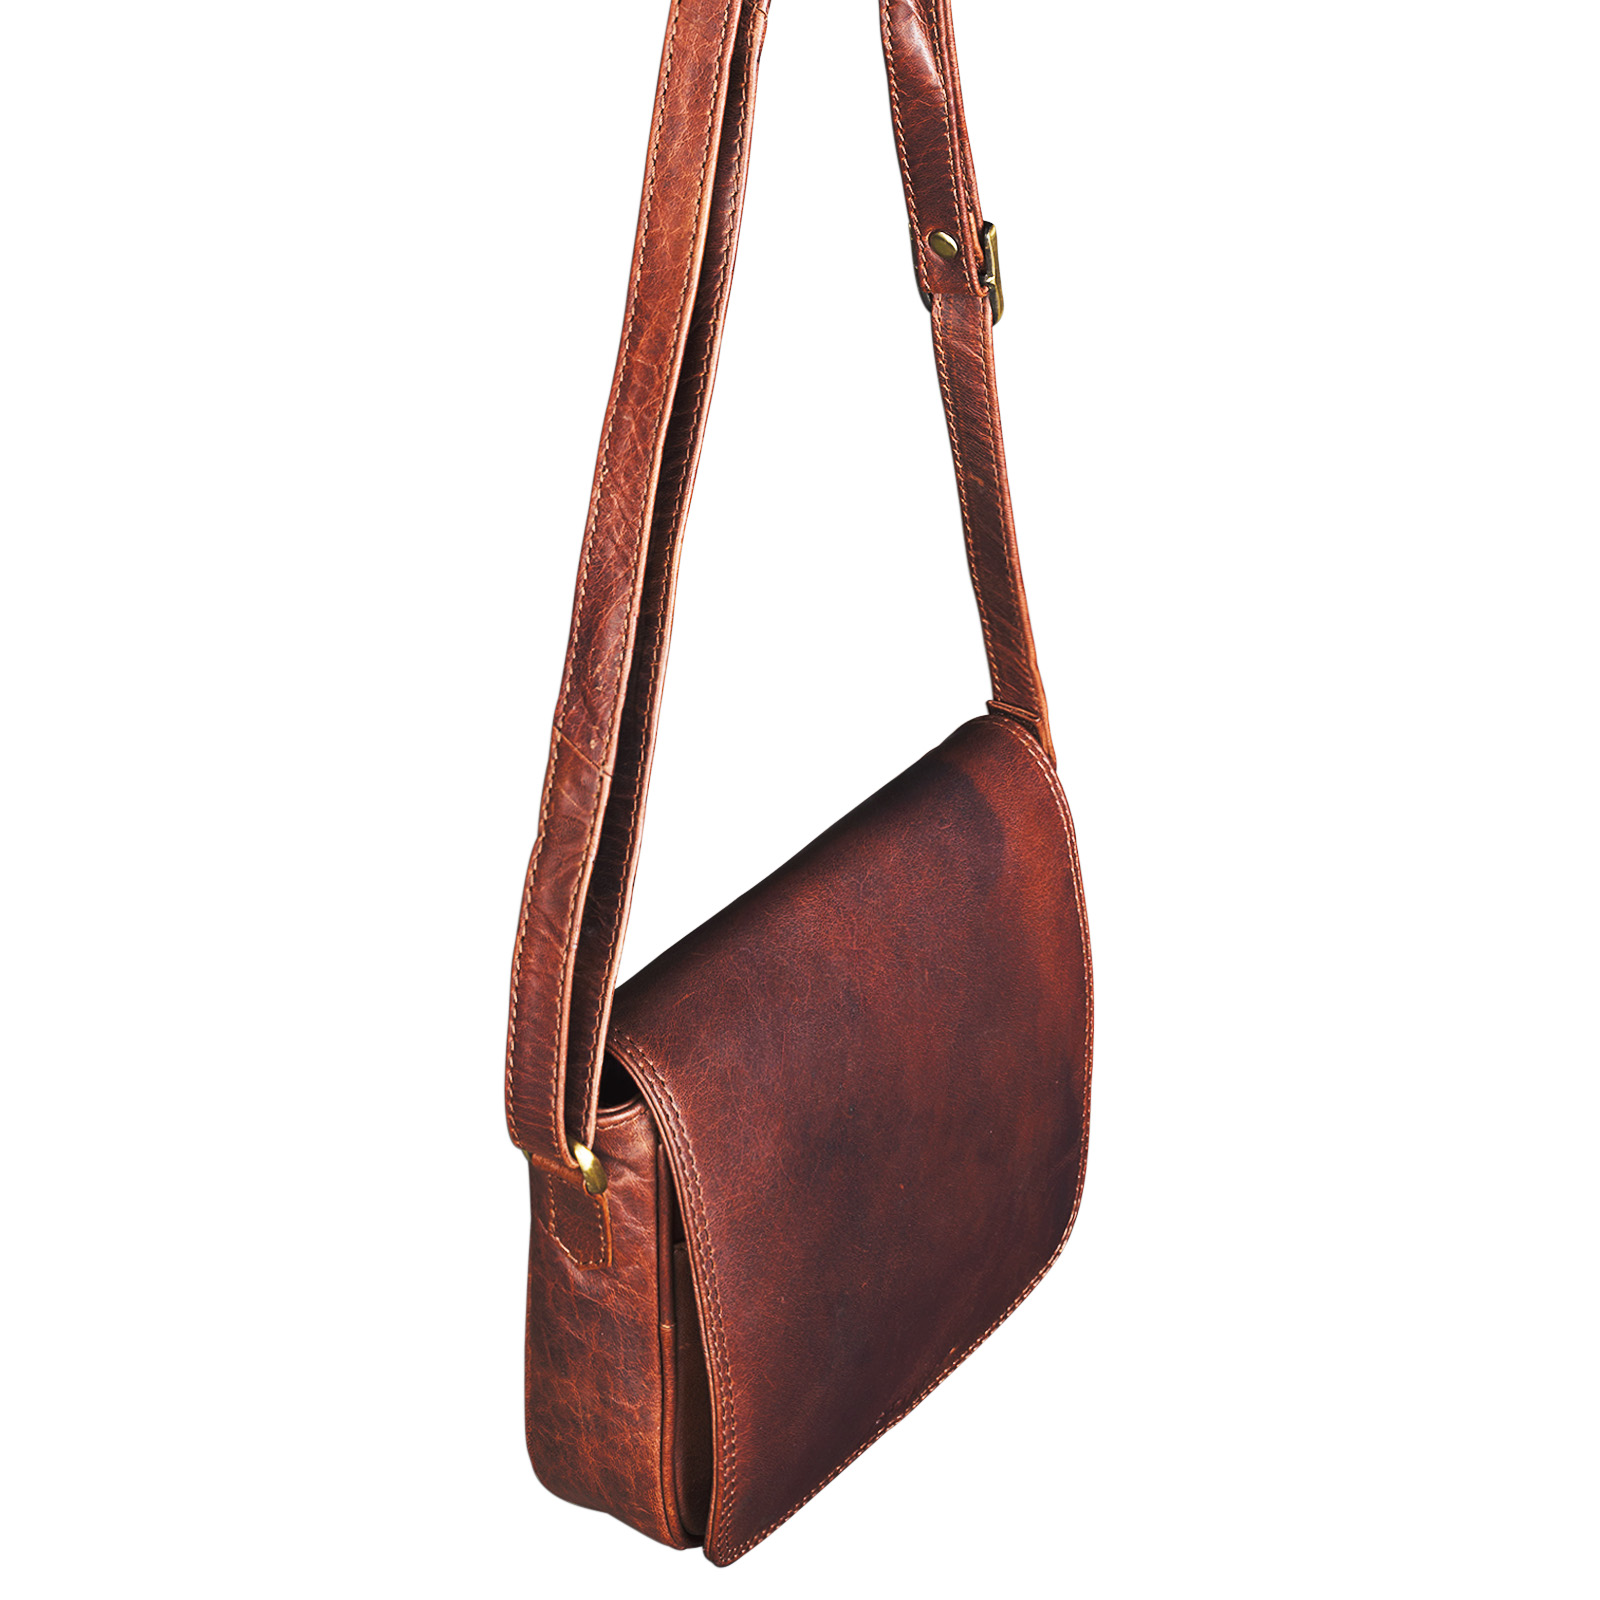 Handtasche Leder cognac braun